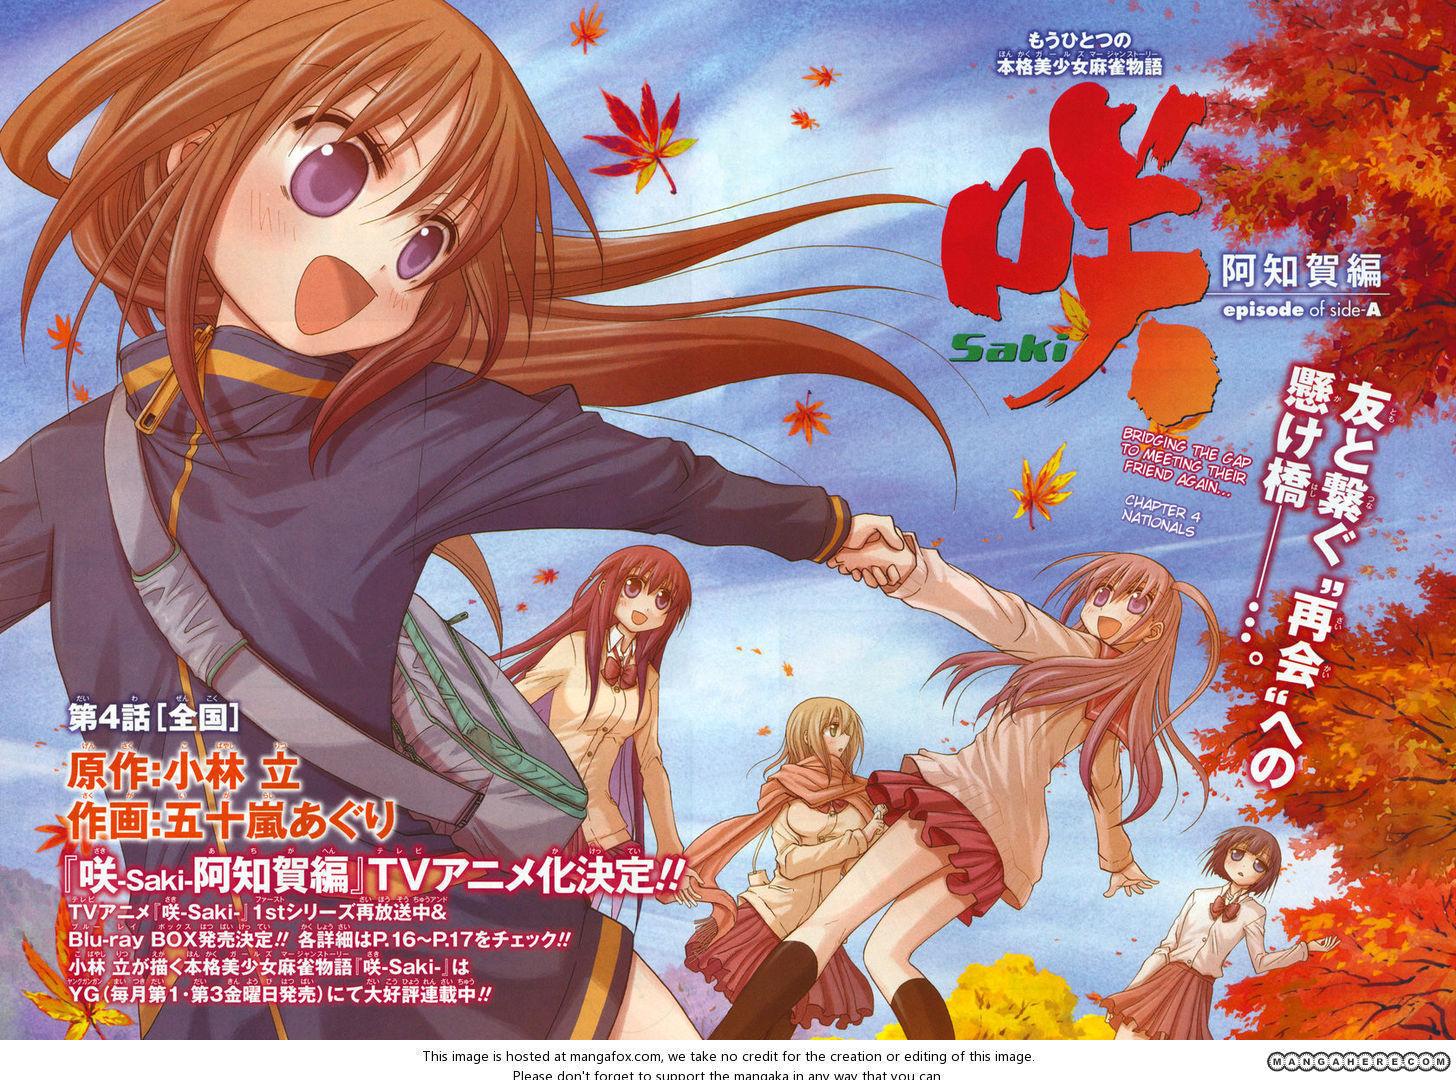 Saki Achiga Hen Episode Of Side A 4 Page 2